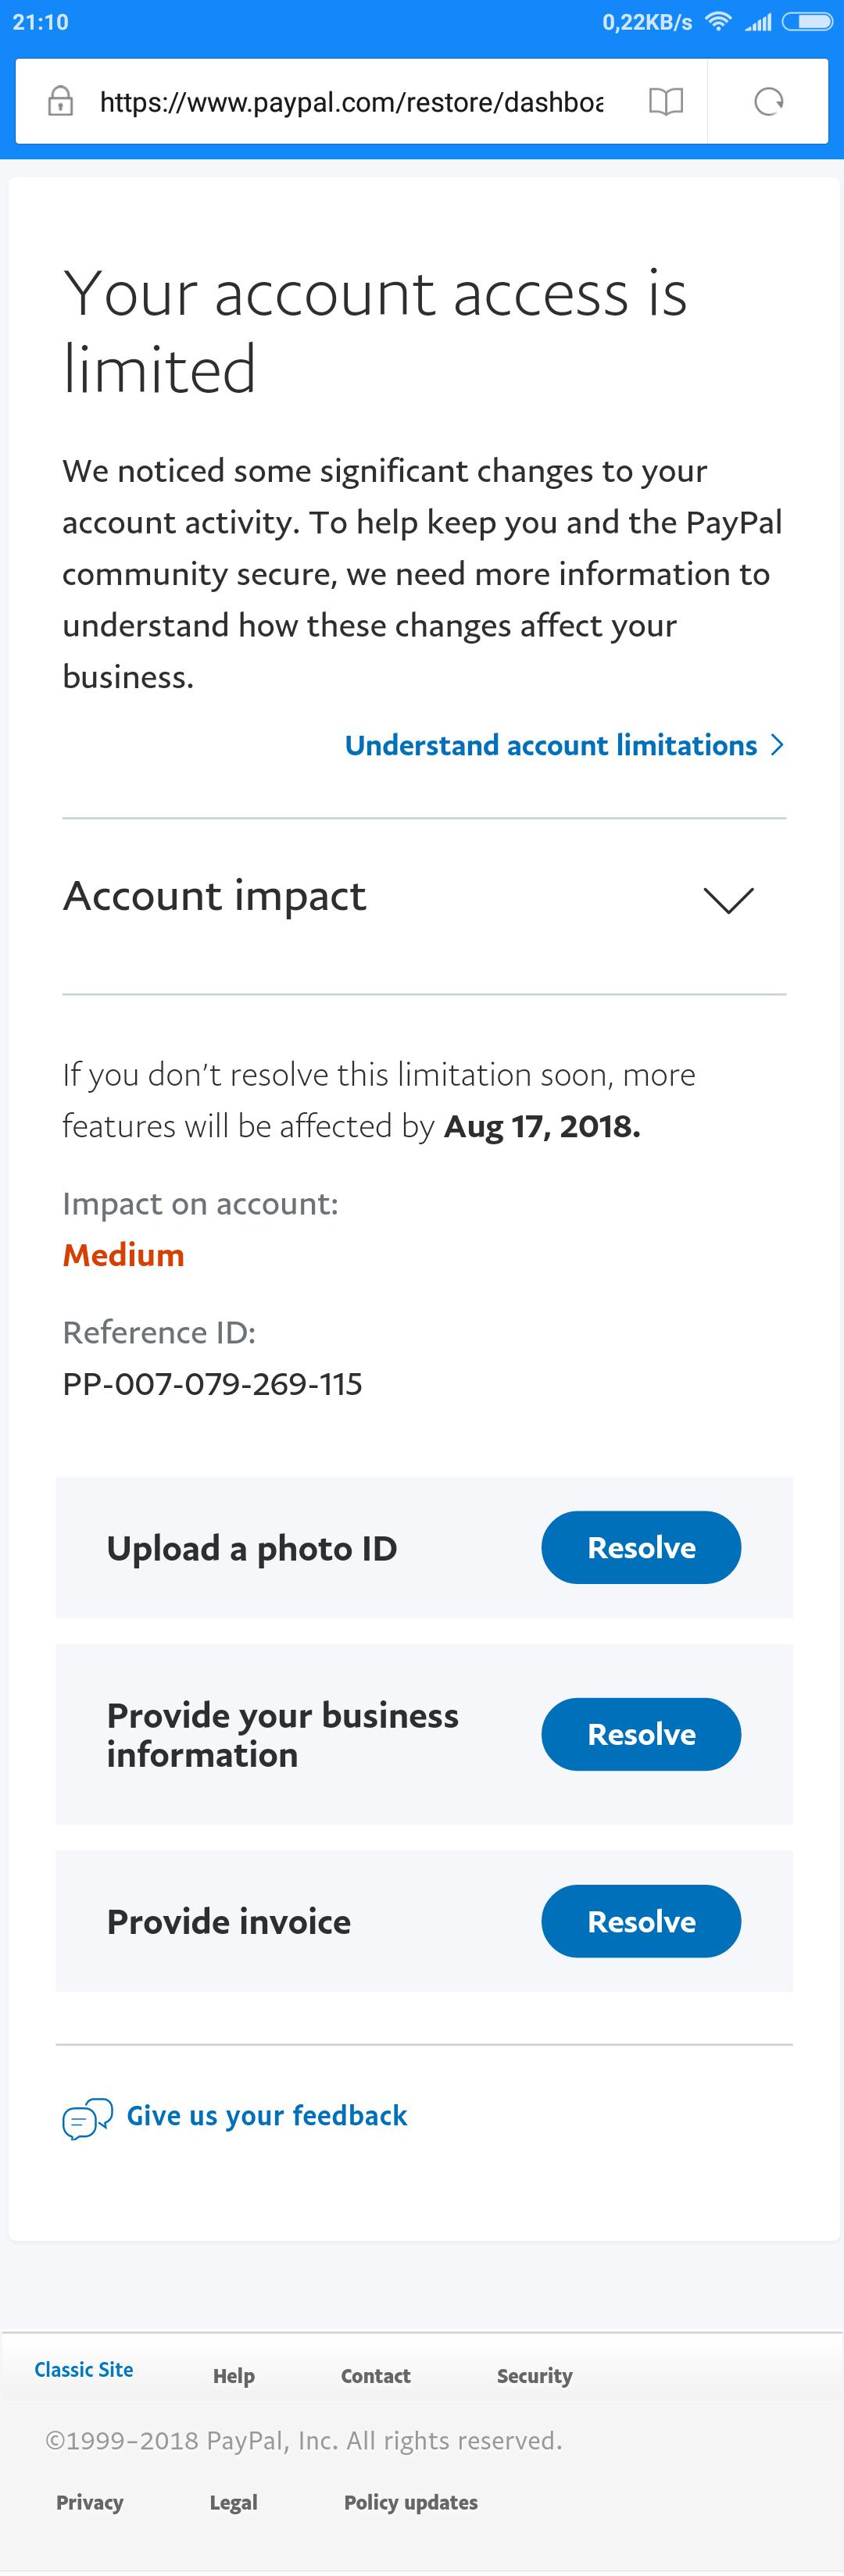 Screenshot_2018-07-07-21-10-34-004_com.android.browser.png